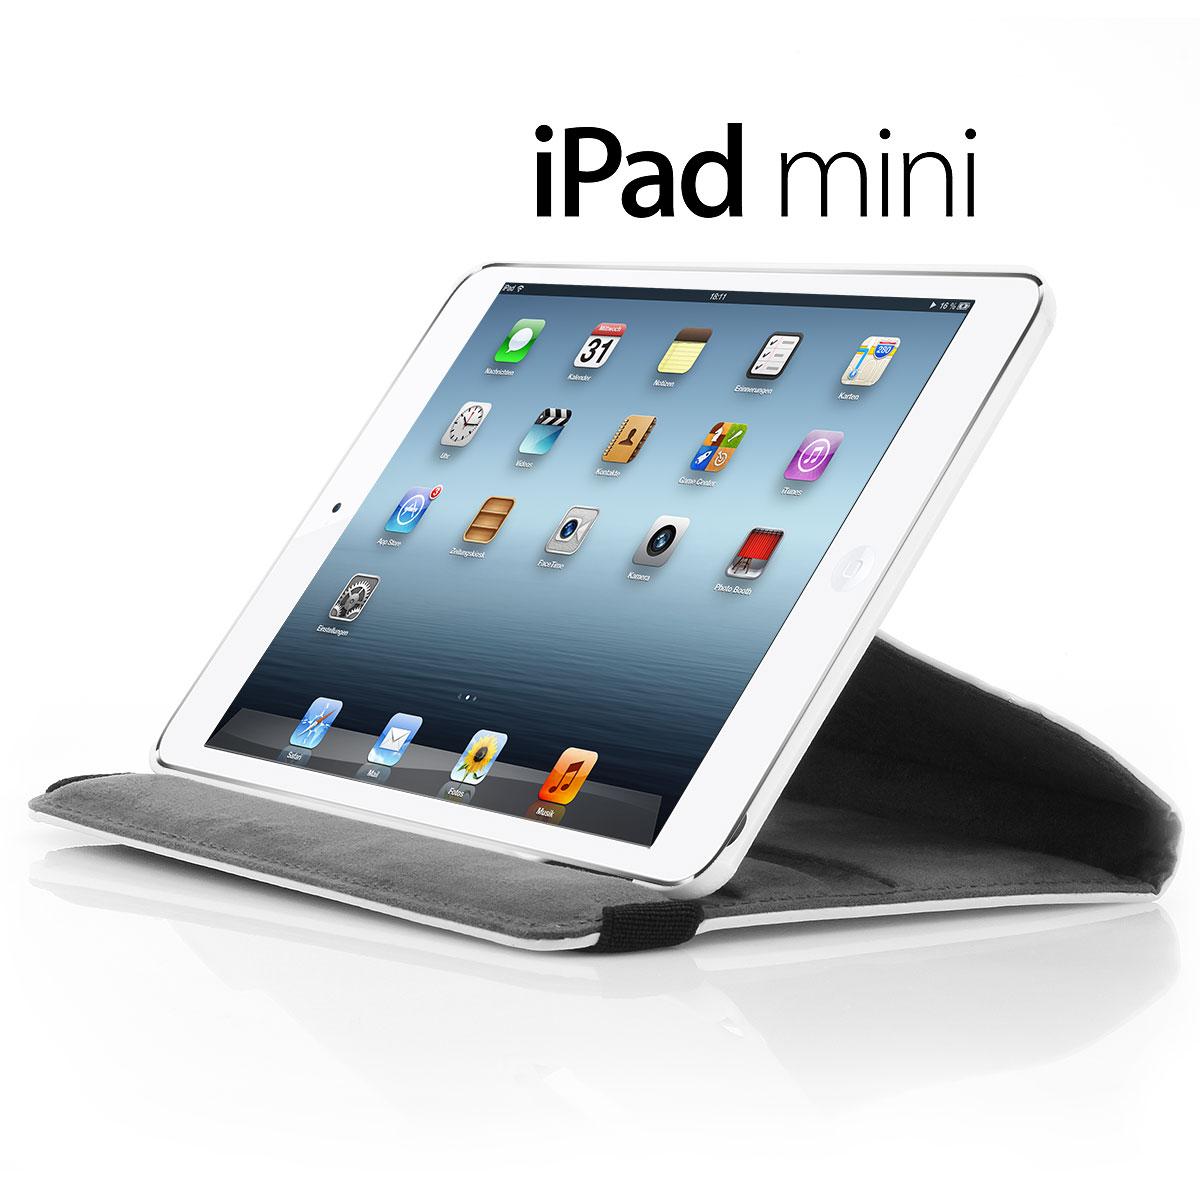 XAiOX iPad Mini Kunstledertasche 360° drehbar - weiss